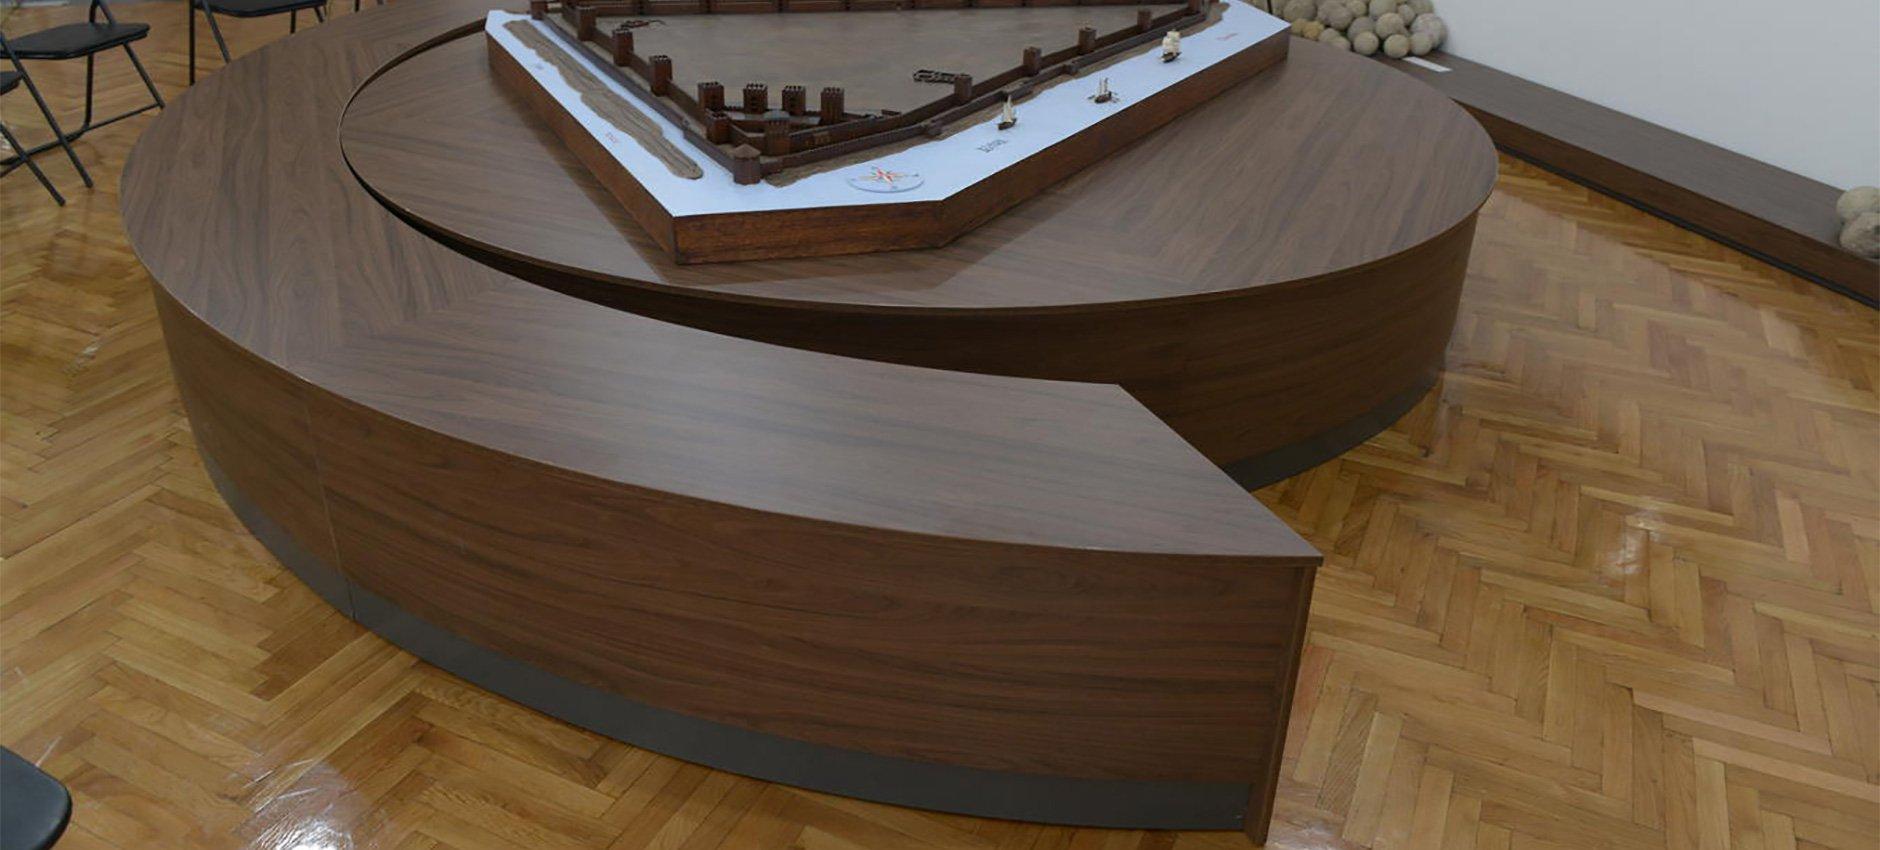 smederevo-muzej-2.jpg